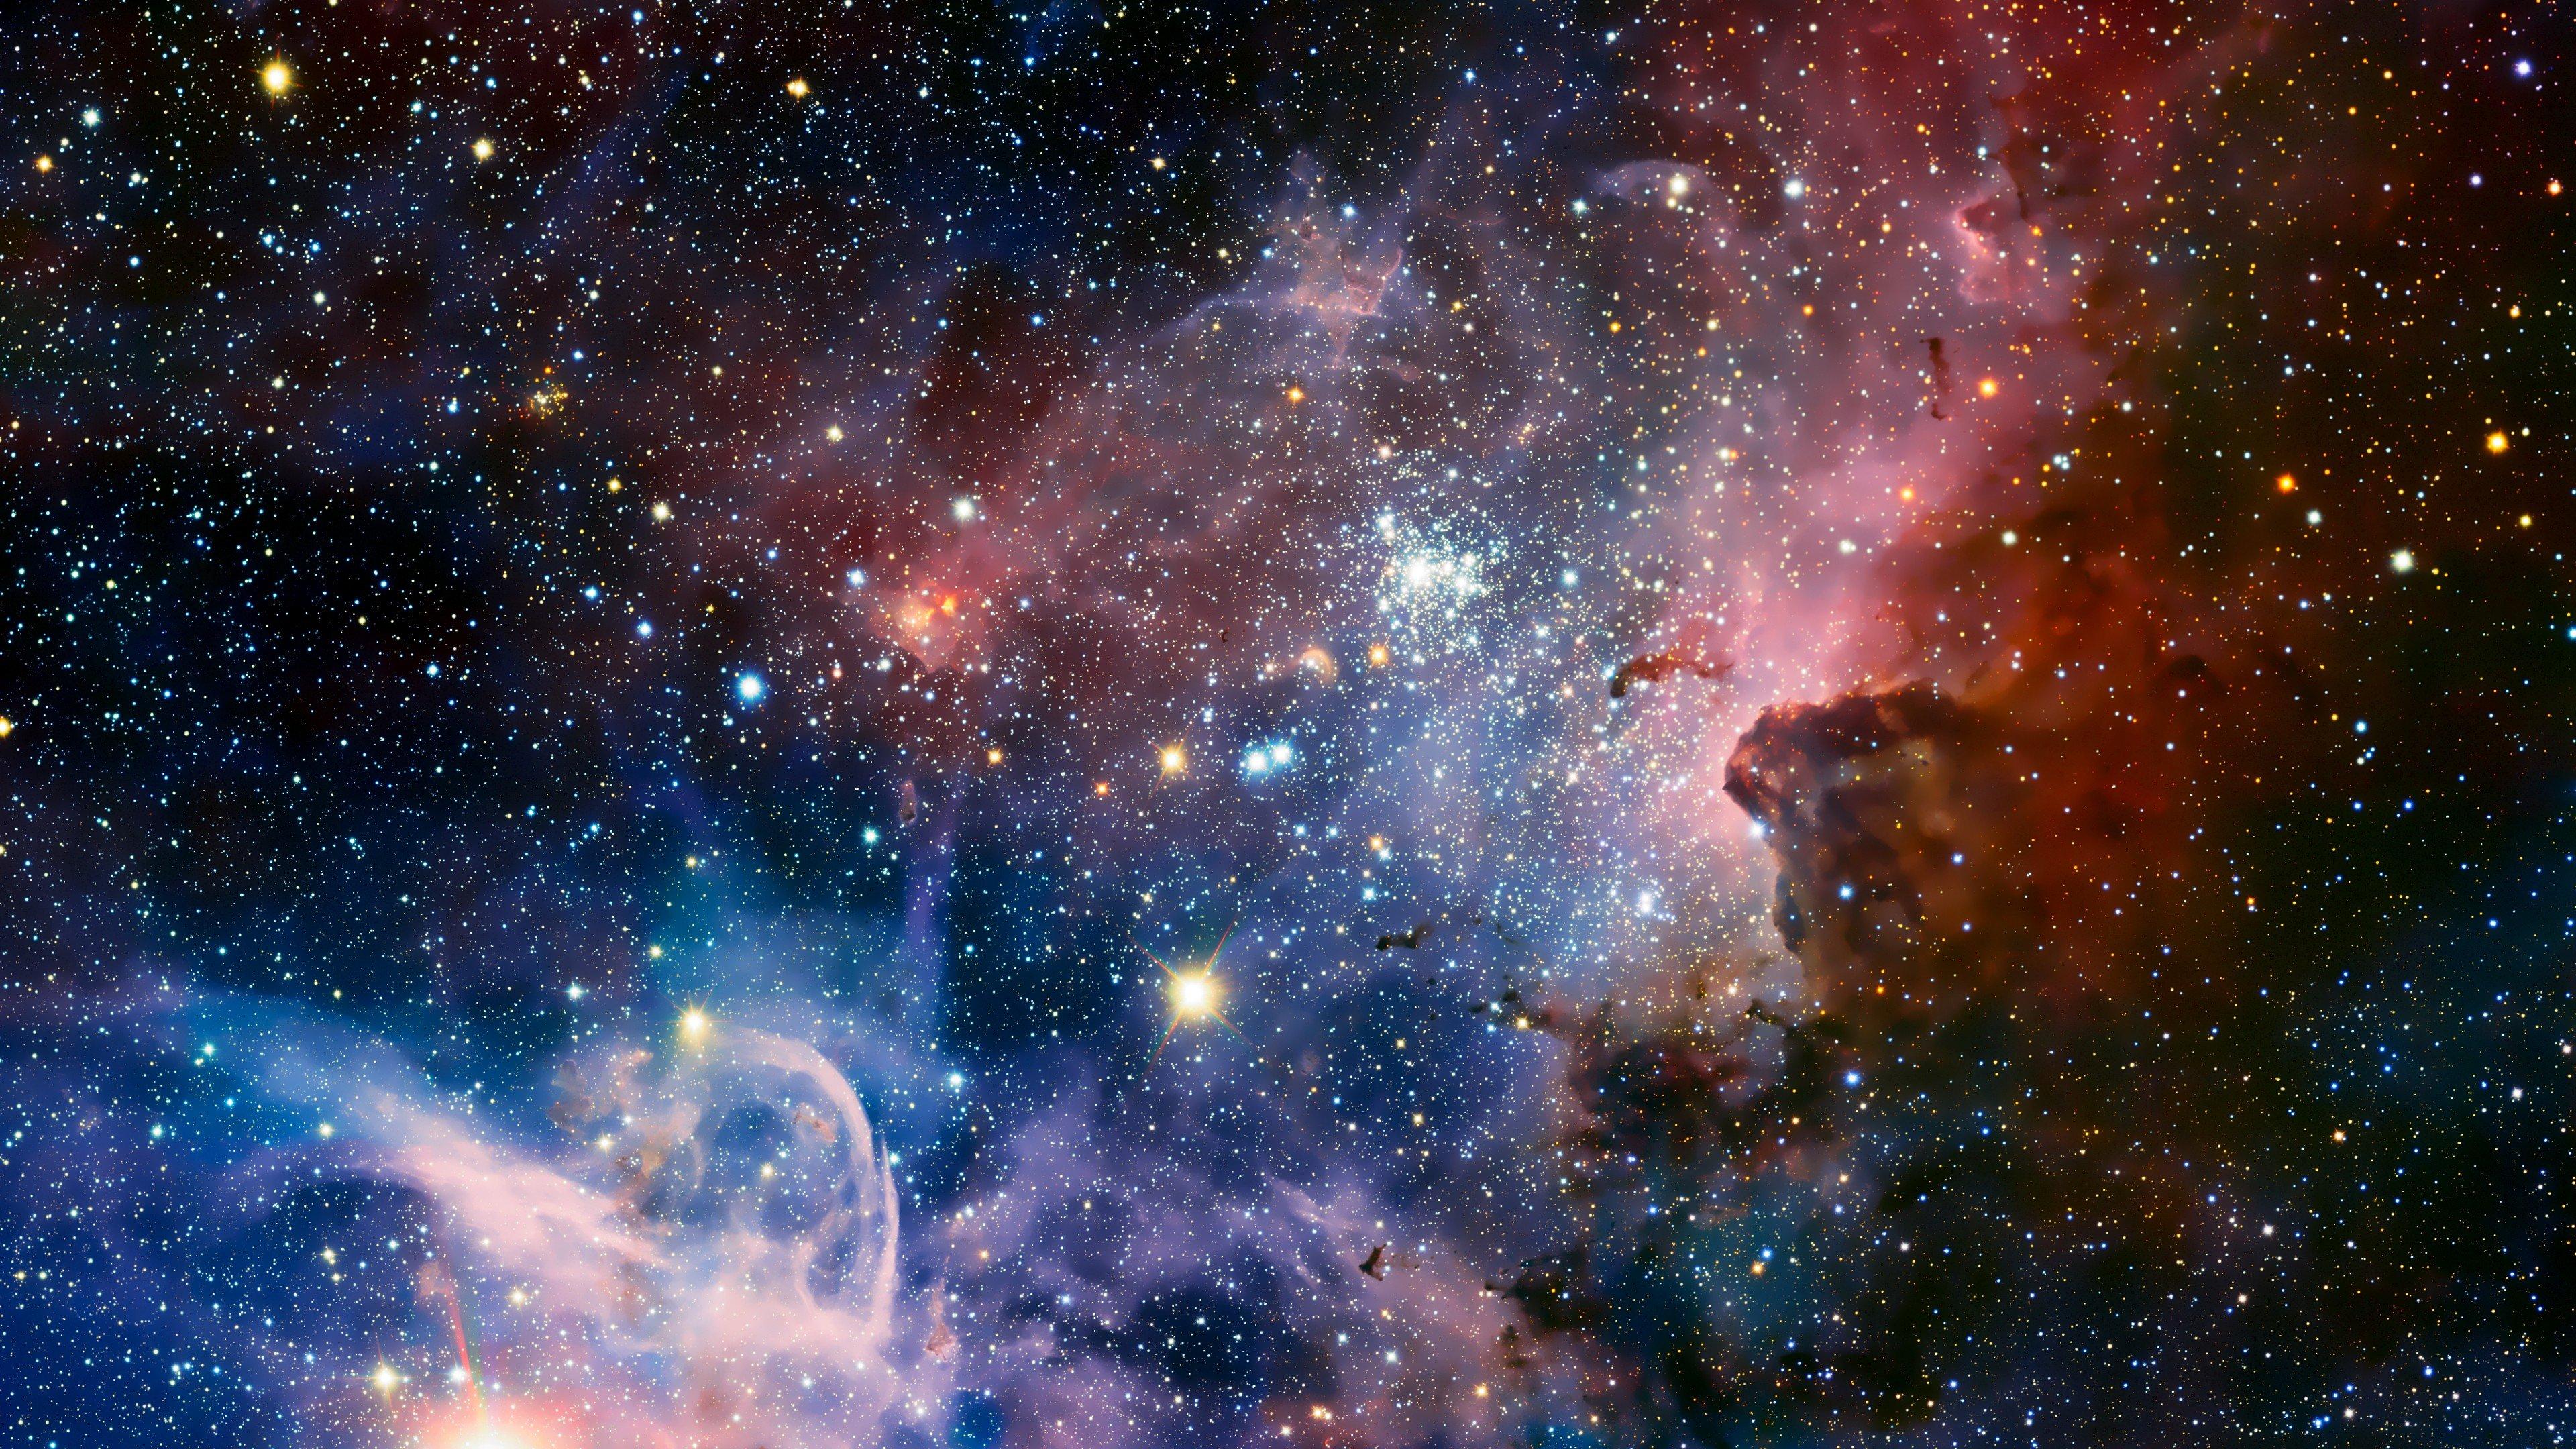 429540-galaxy-nebula-outer-space-stars-17dc614bdd3673496aa4aadbf1e0a0f2-